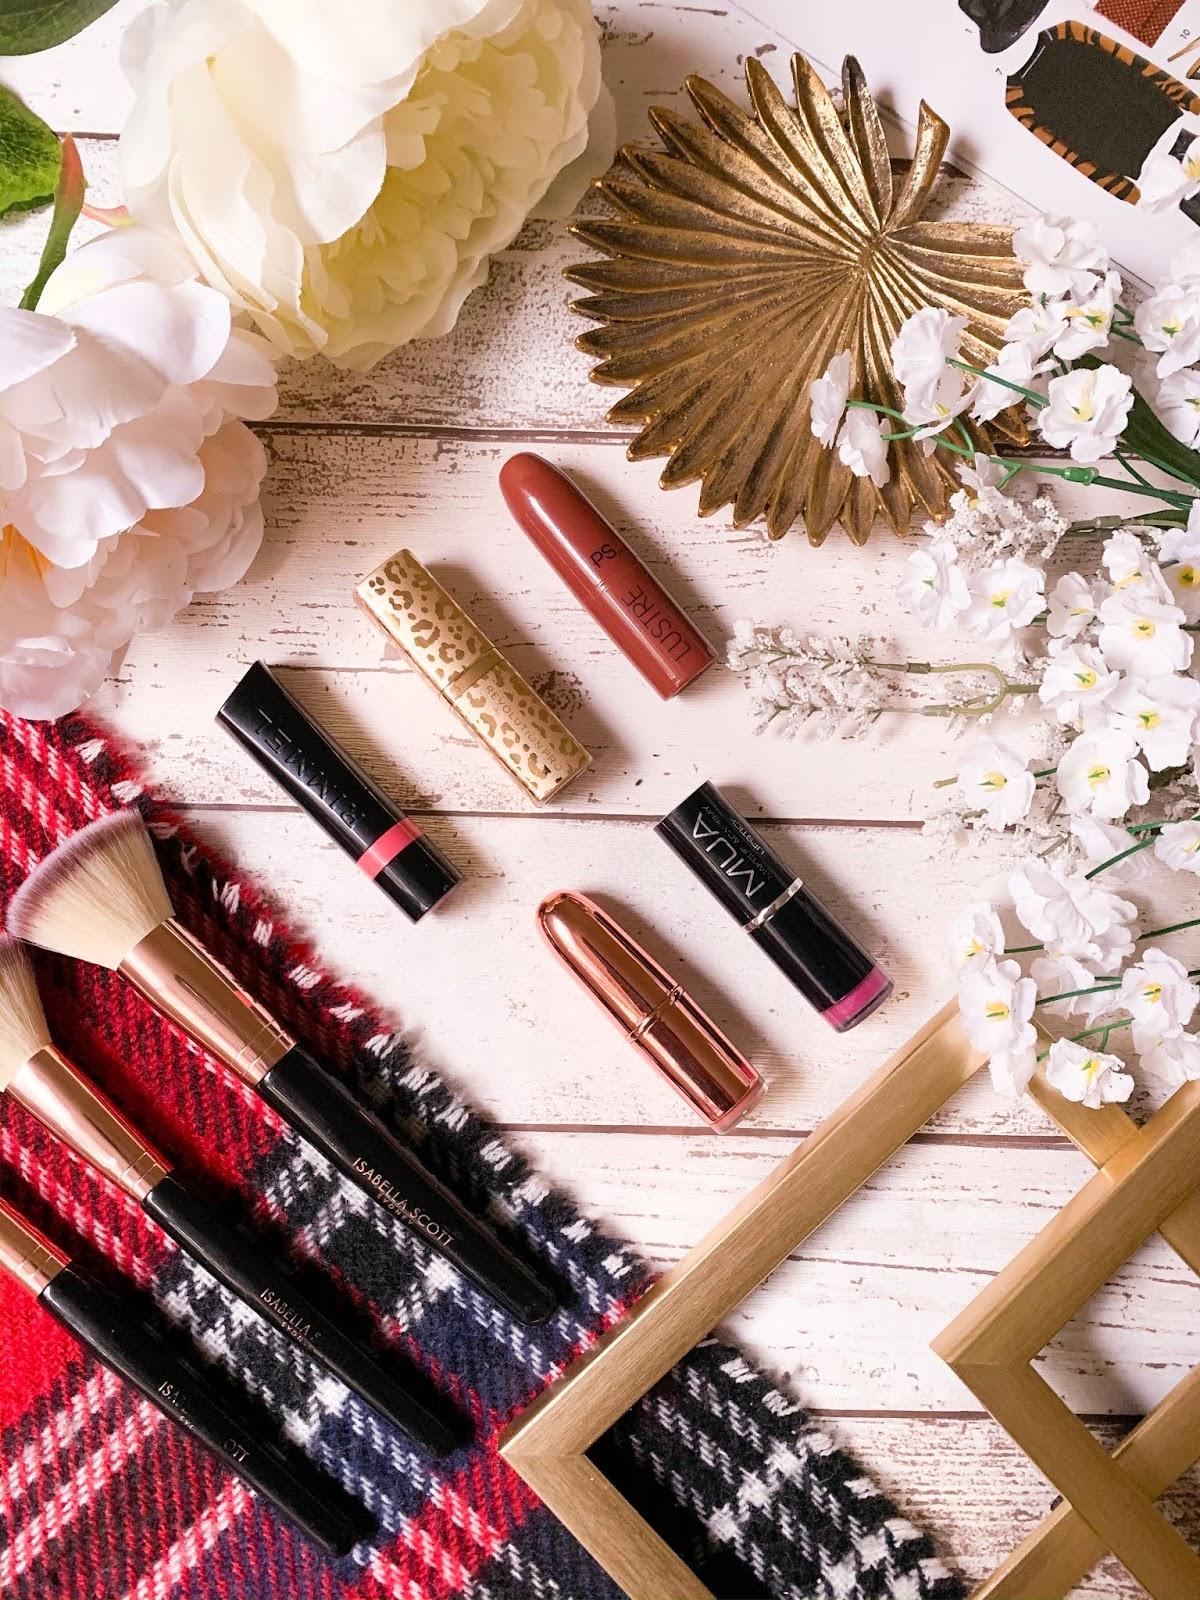 5 Under £5: Lipsticks Flatlay